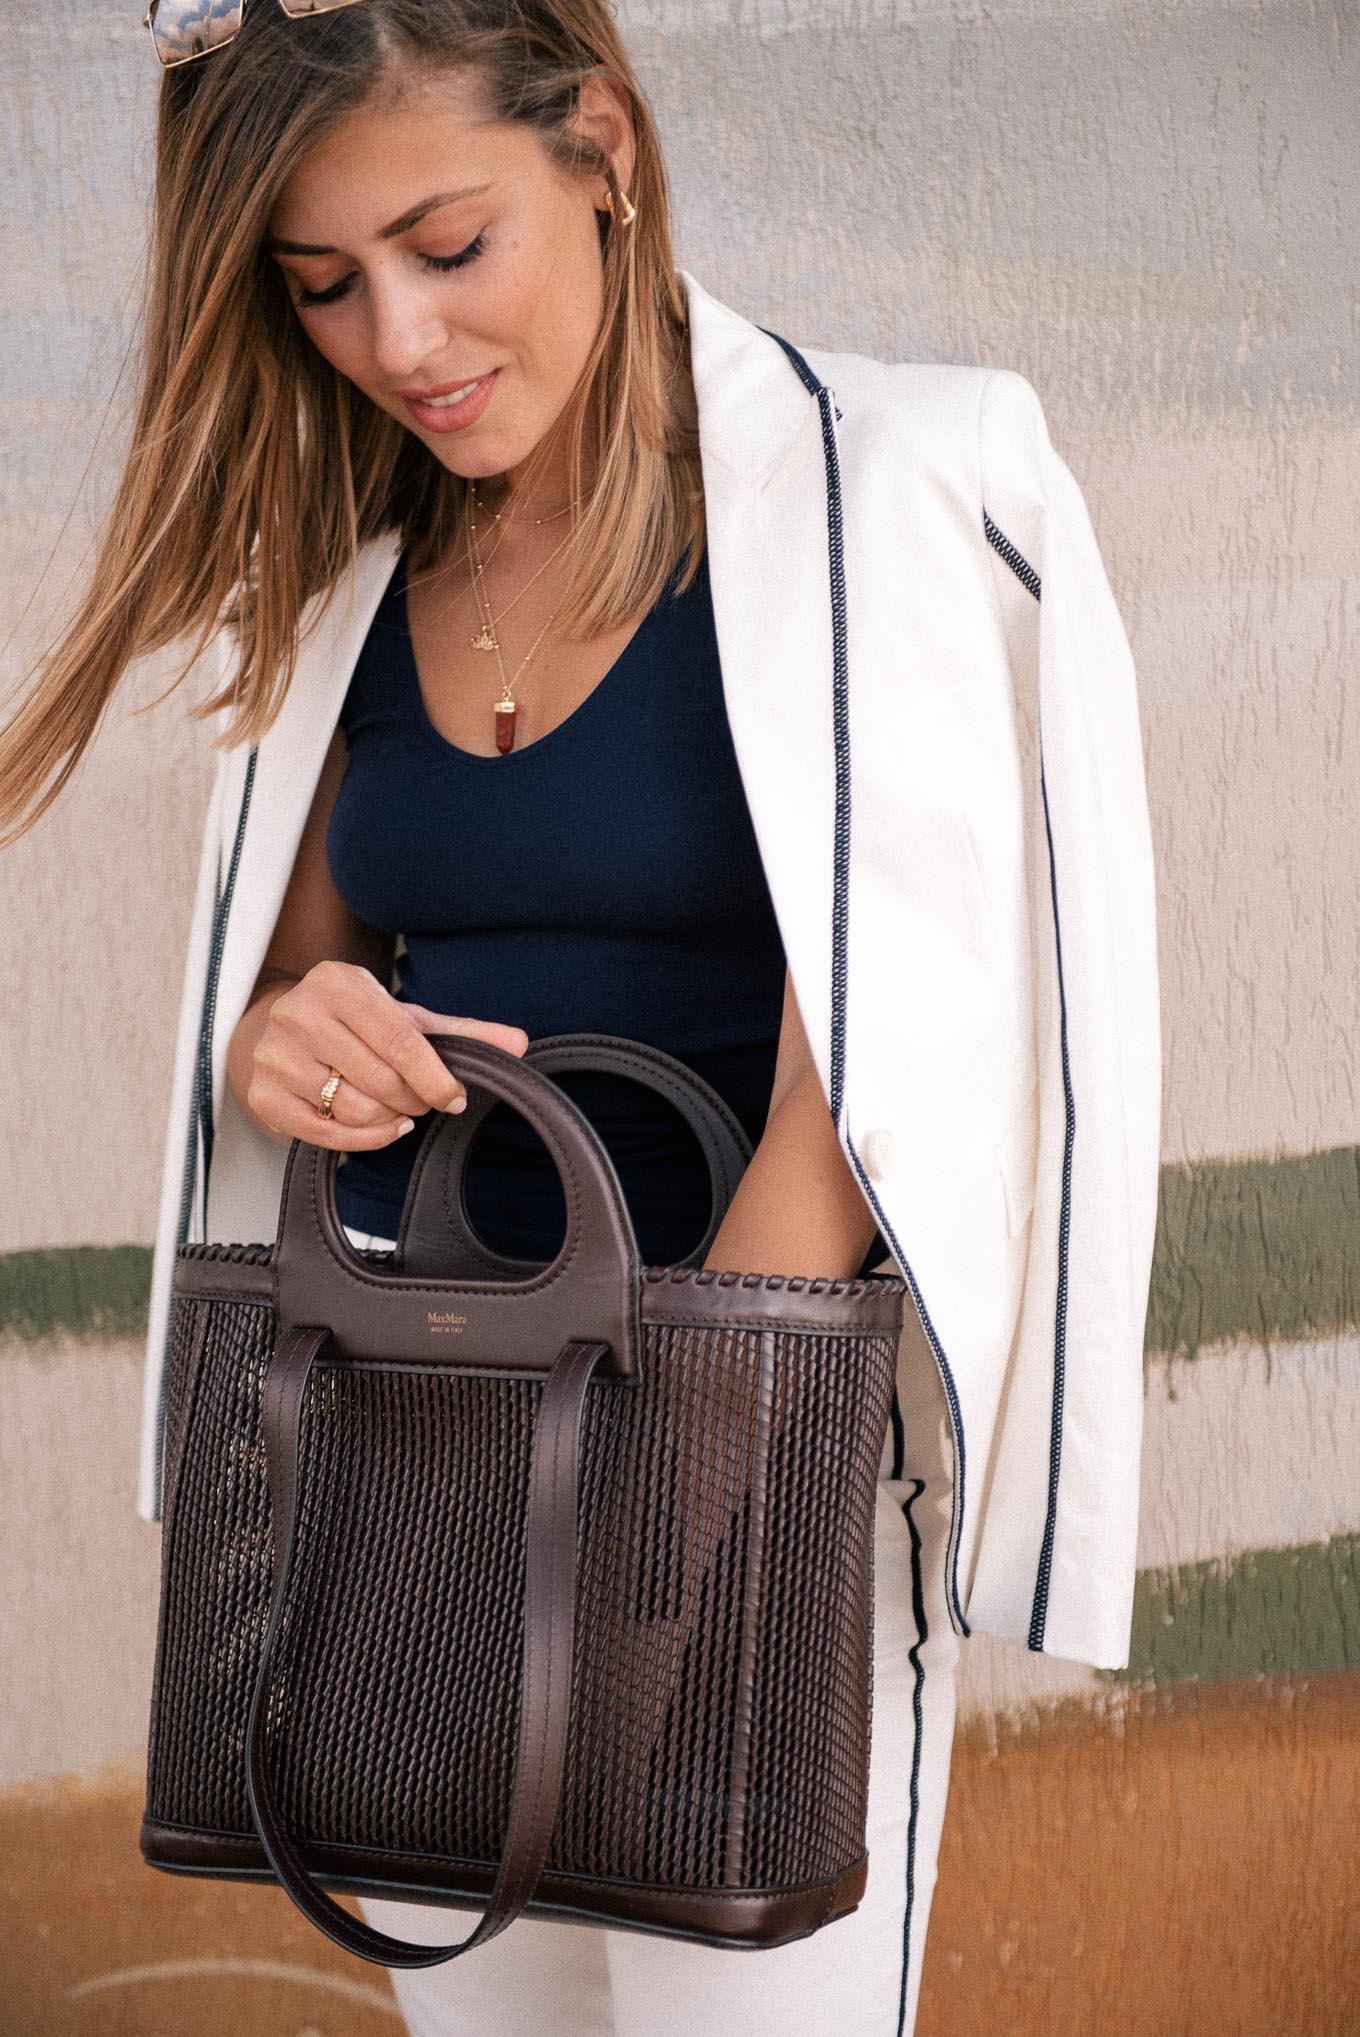 Max Mara hand bag